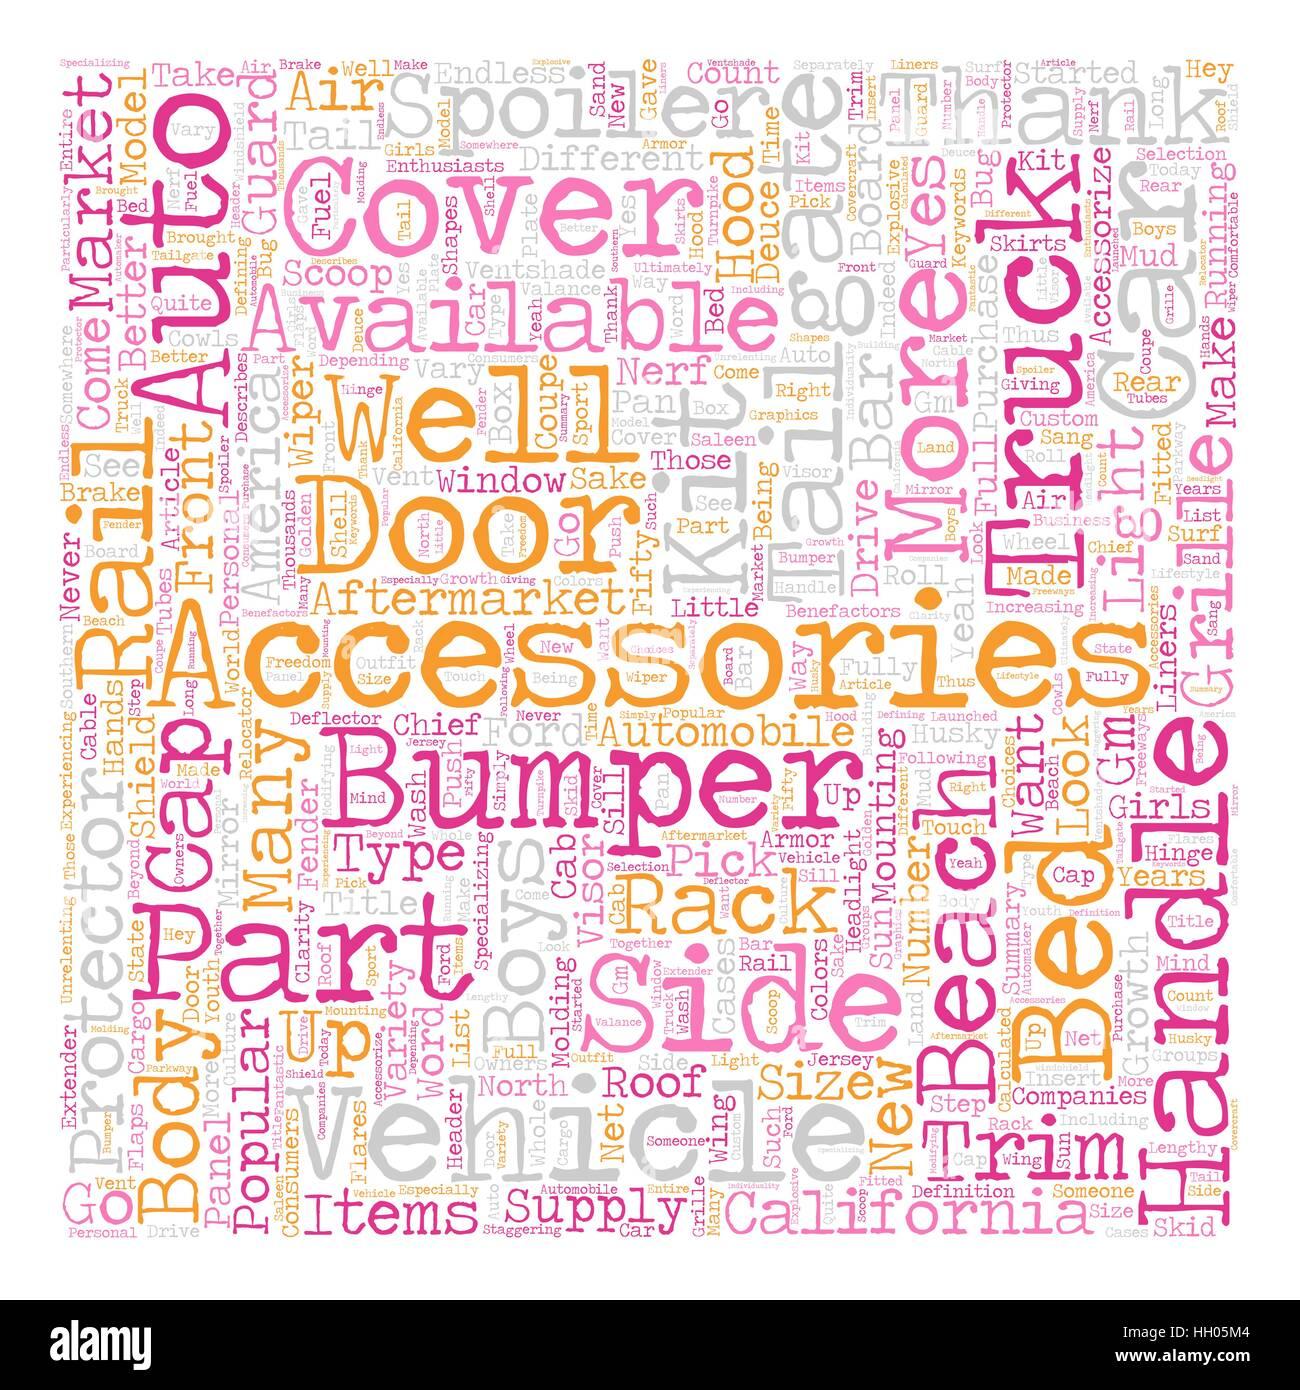 Auto Accessories Stock Photos & Auto Accessories Stock Images - Alamy